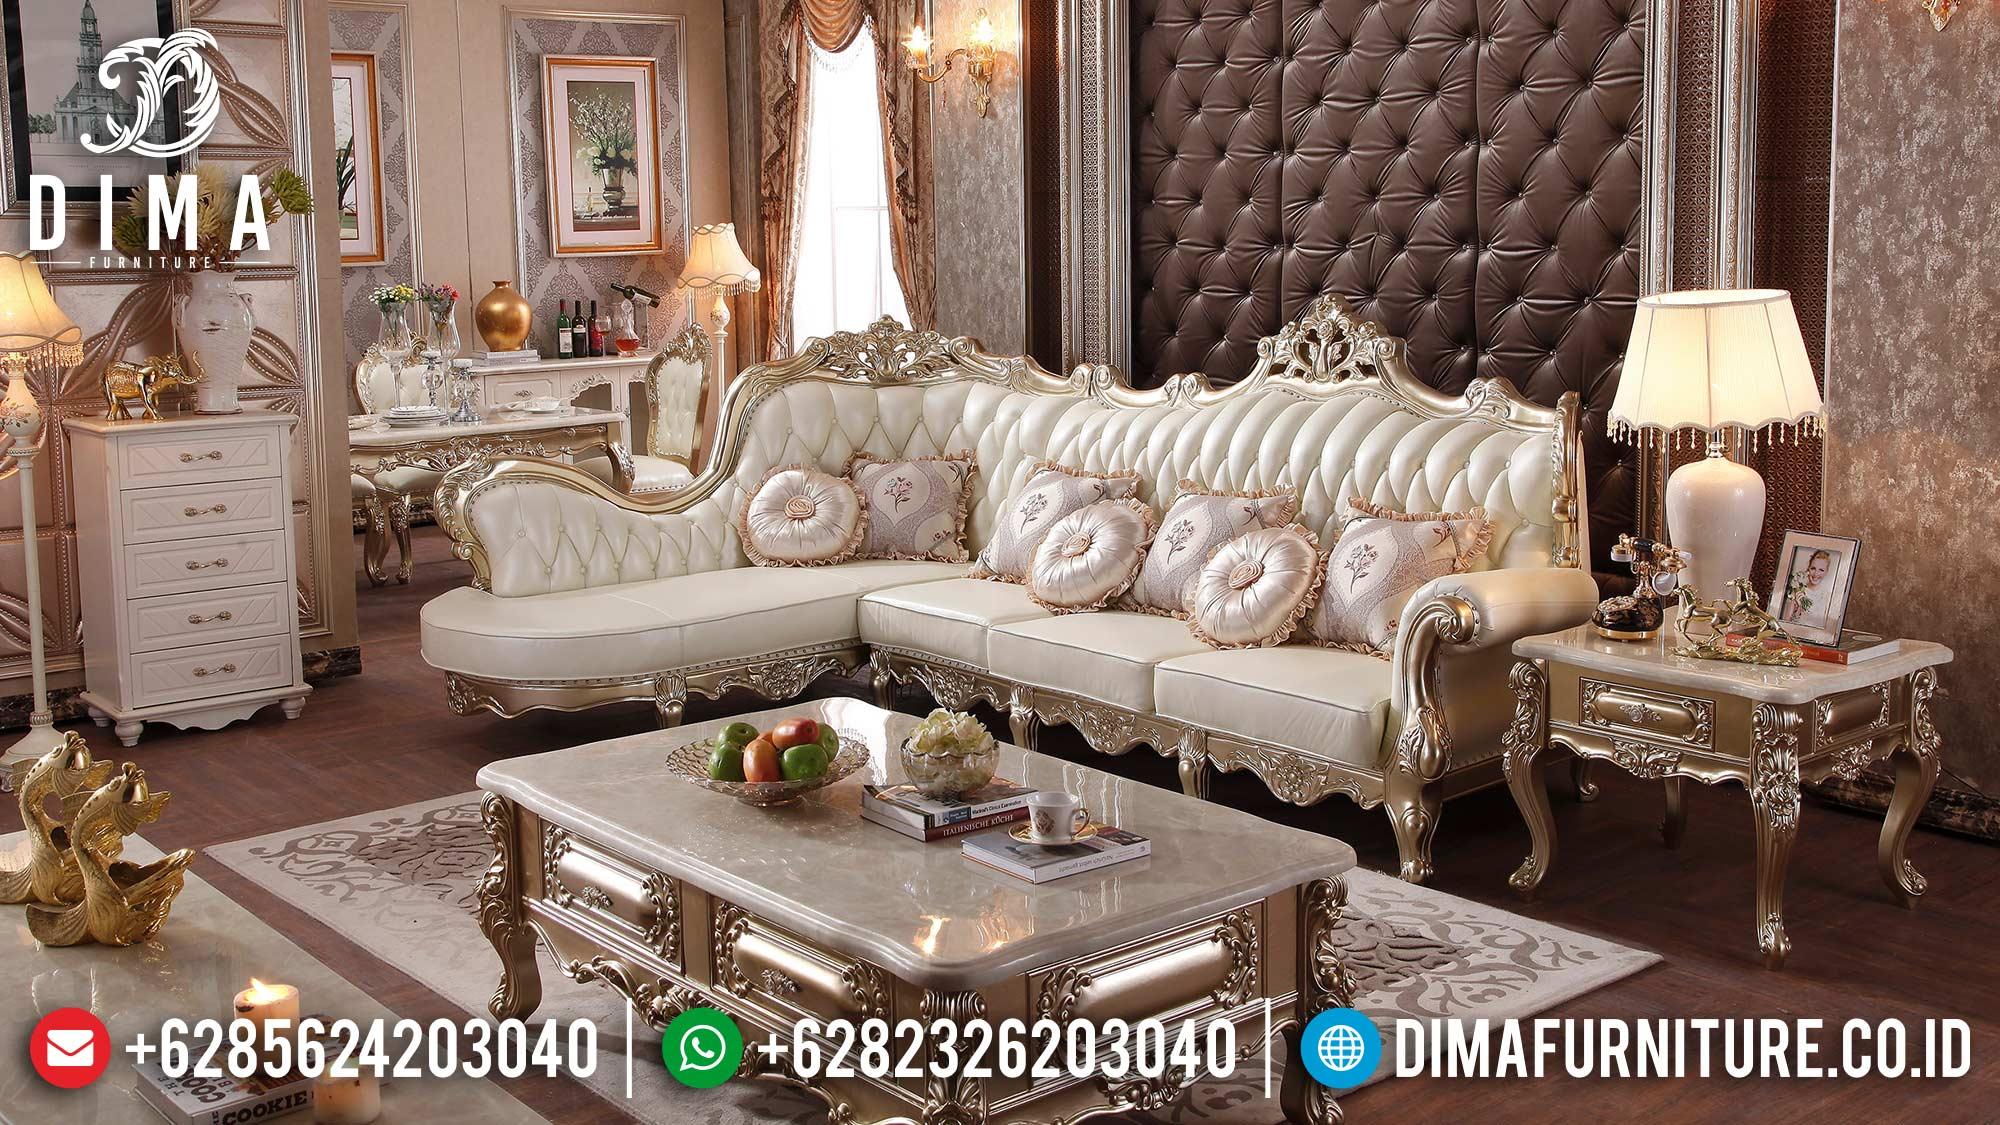 New Style Sofa Tamu Ukiran Sudut Luxury Classic Golden Champagne Color Glossy ST-1350